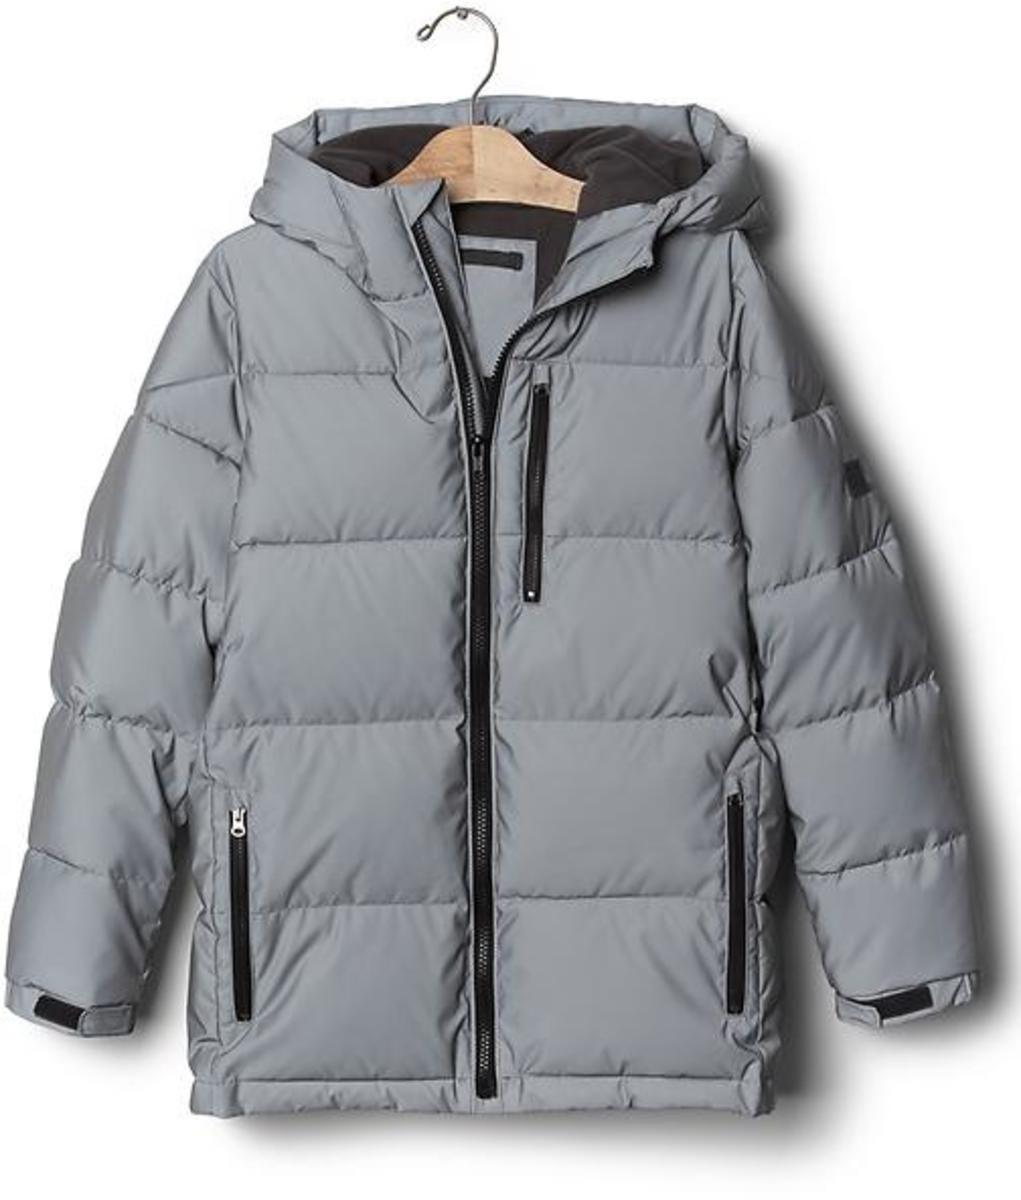 be9027698aeb Gap Boys Coldcontrol Max Reflective Puffer Jacket - Metallic grey ...